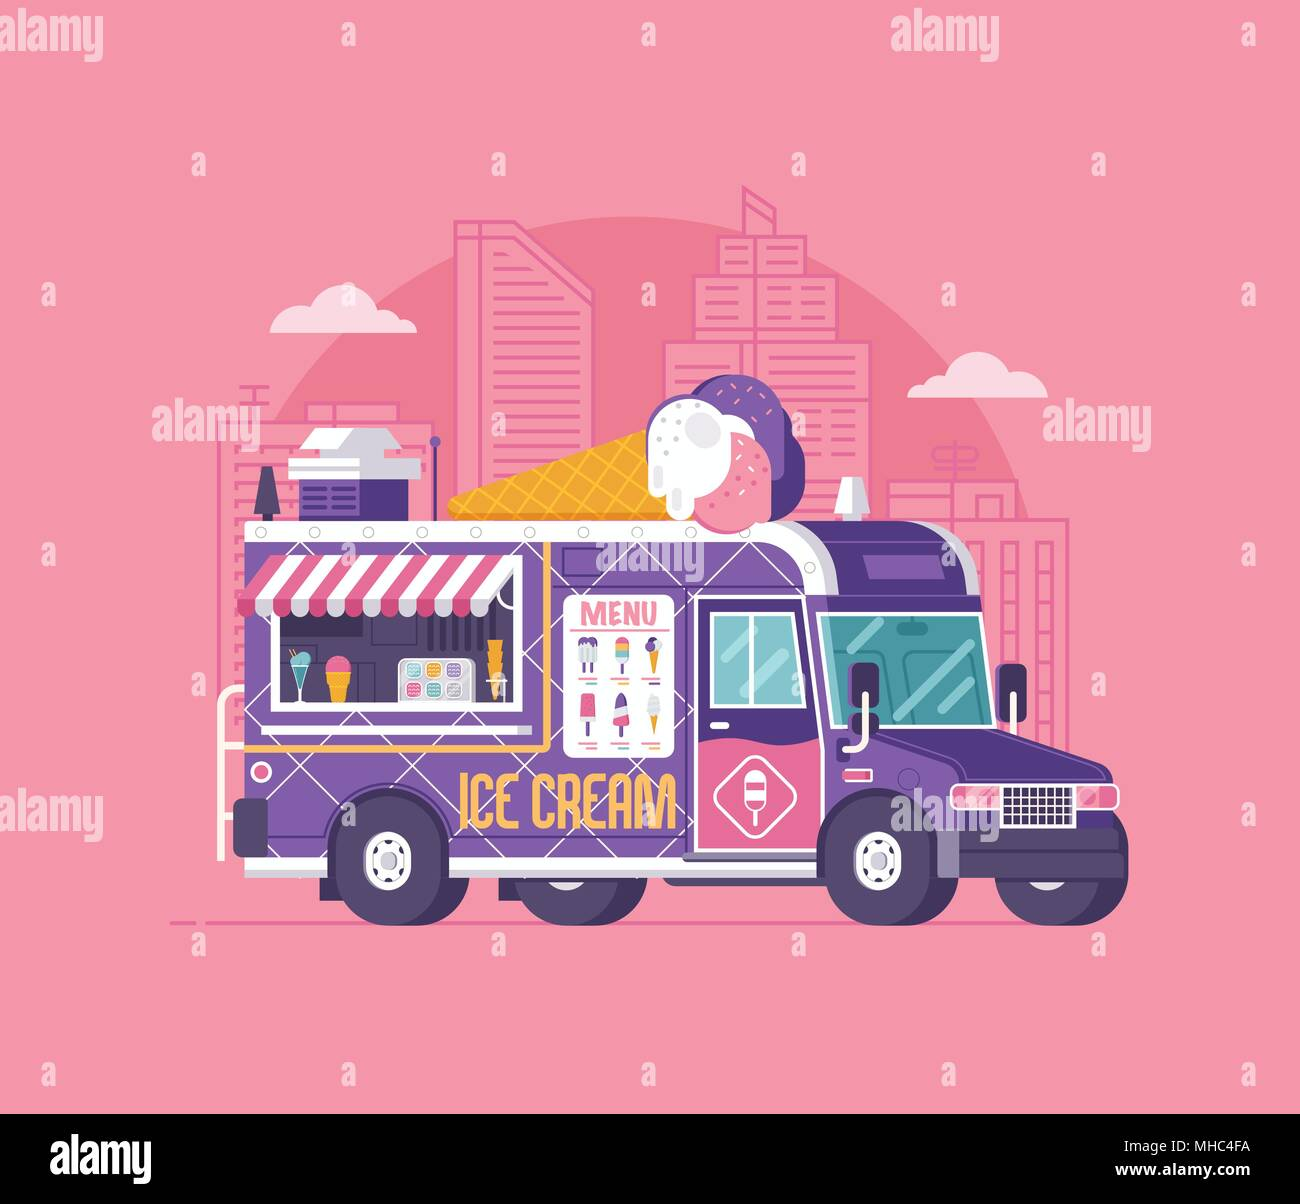 Retro ice cream van in flat design. City street food car. Summer kitchen auto kiosk vector illustration. Cartoon ice-cream truck illustration. Vintage Stock Vector